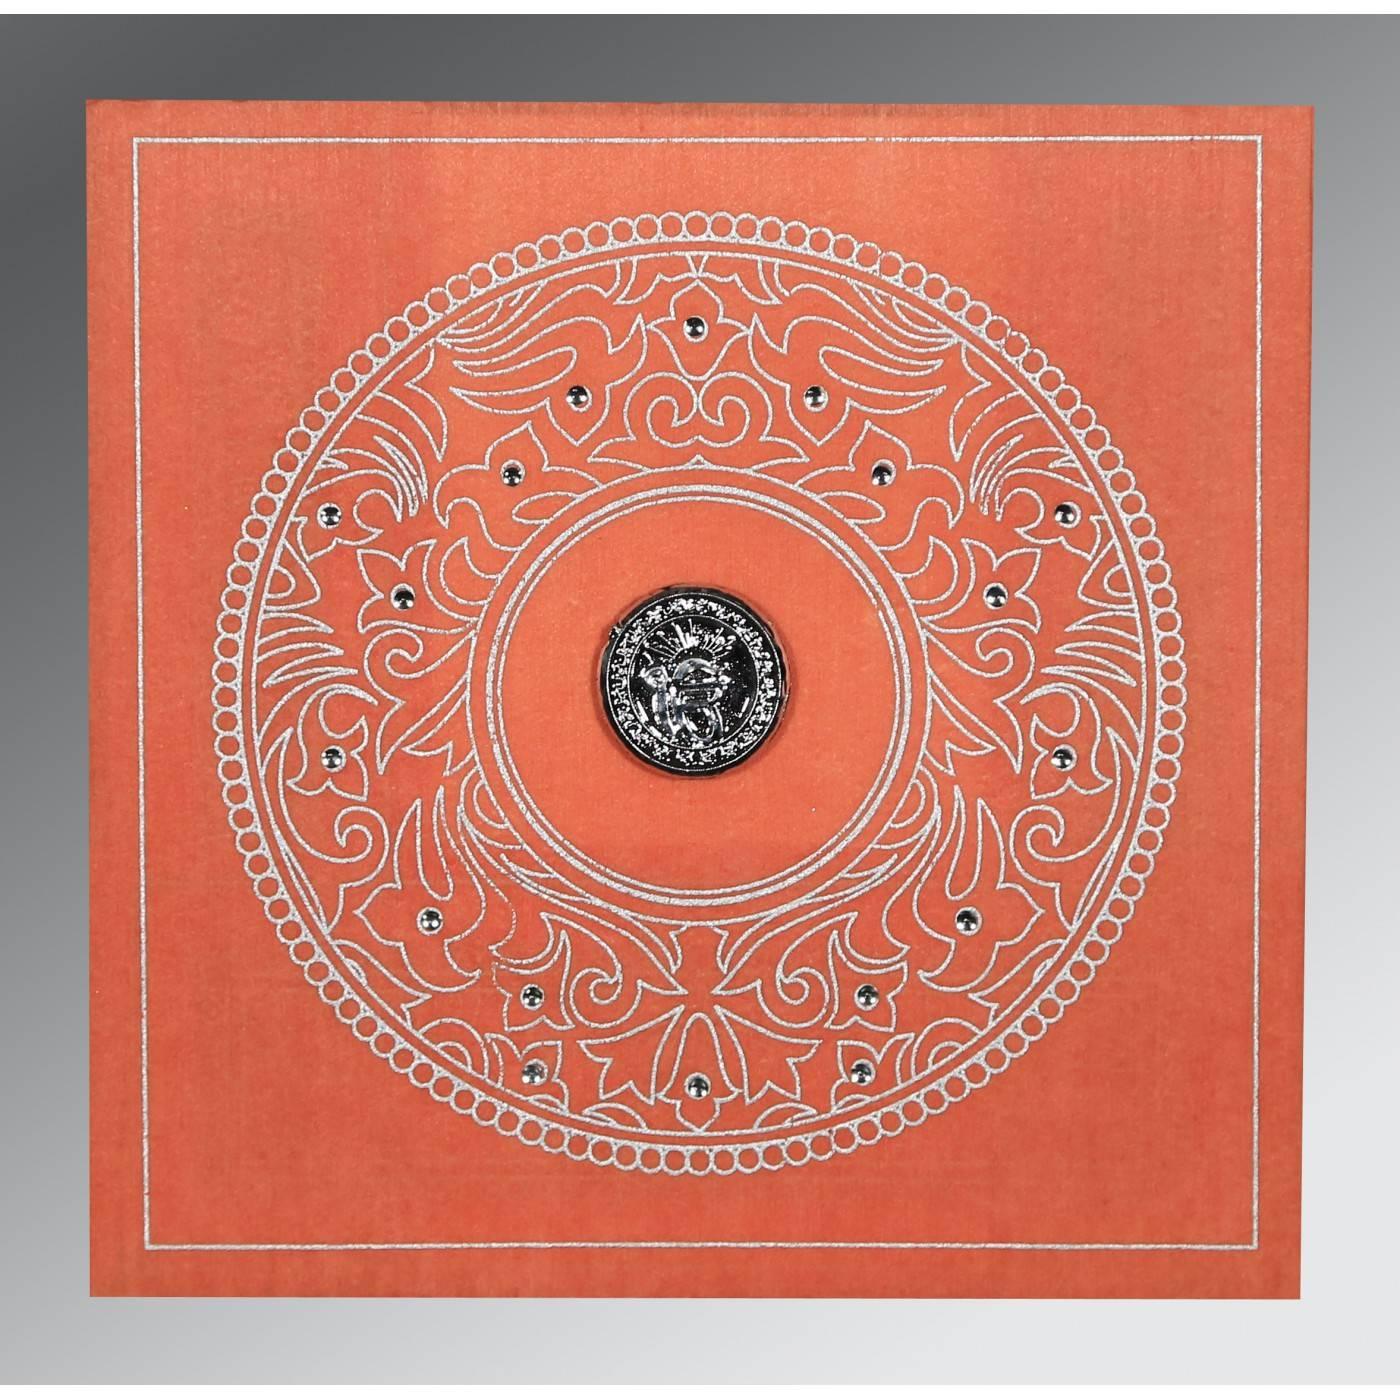 AZALEA PINK WOOLY SCREEN PRINTED WEDDING CARD : CS-8214M - IndianWeddingCards